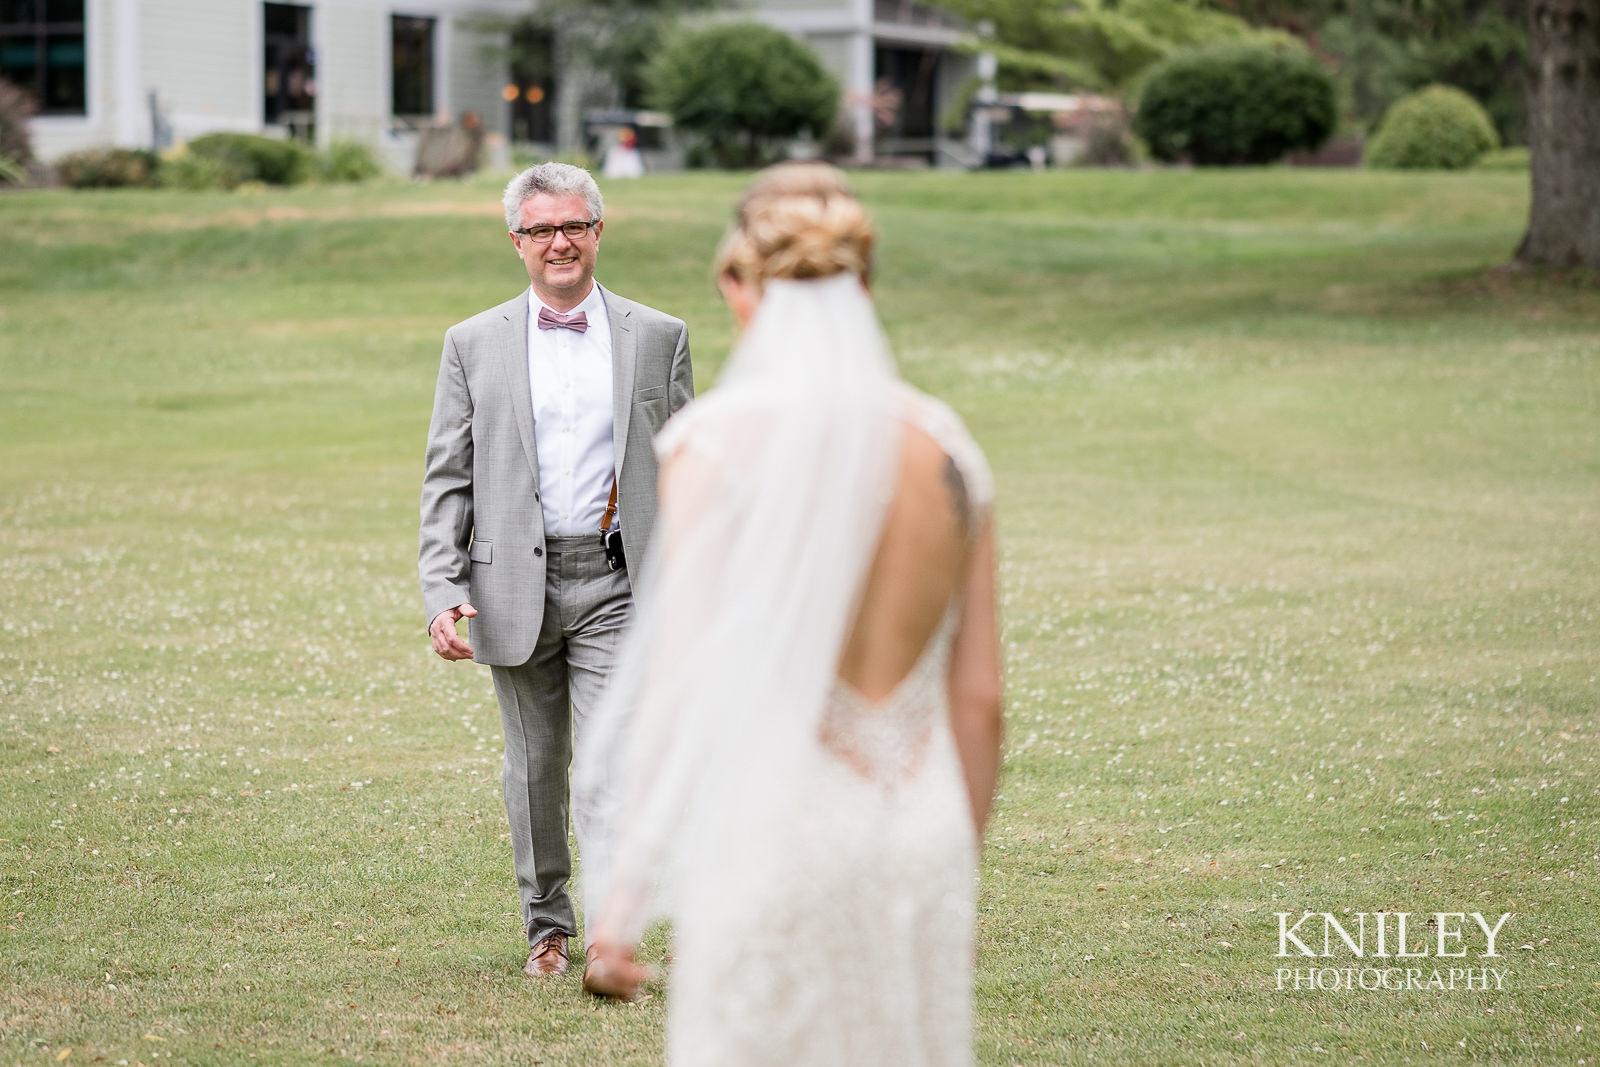 020 - Ontario Golf Club Wedding Pictures - XT2A6502.jpg